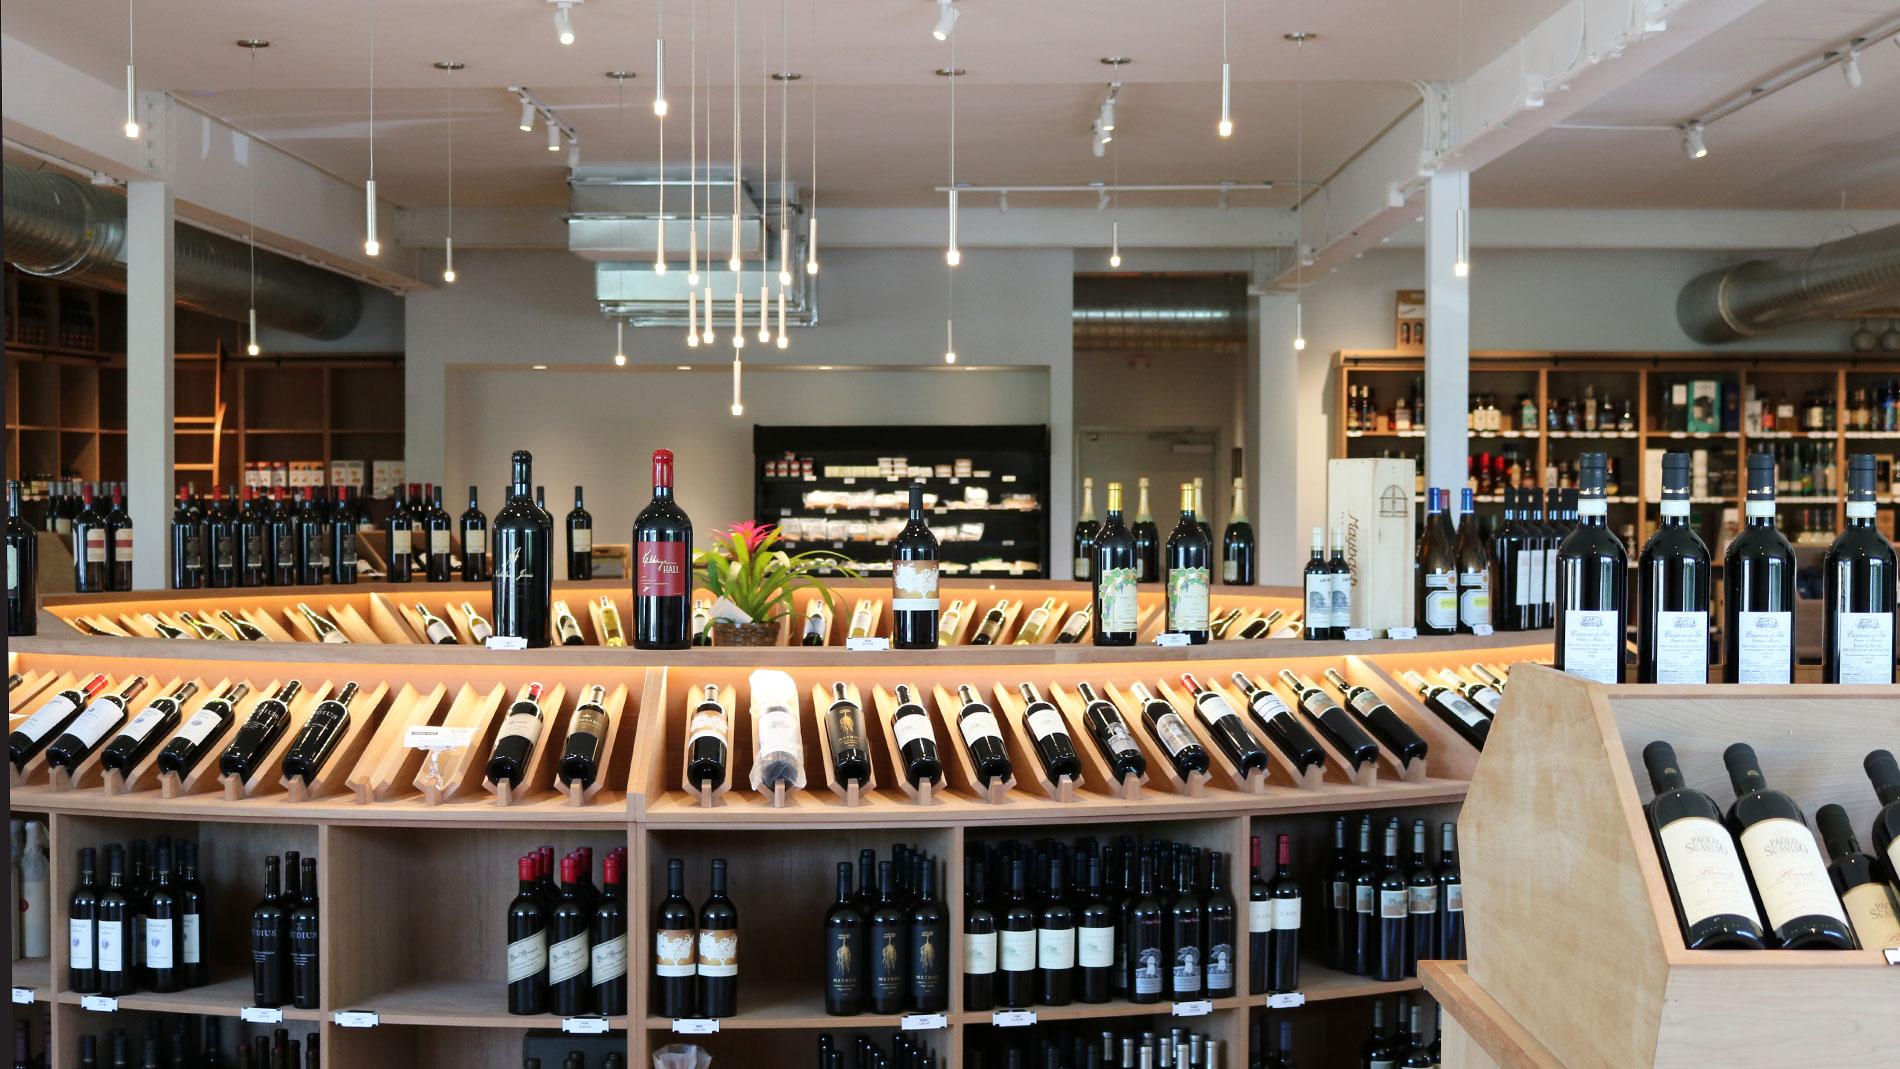 clayton winehouse